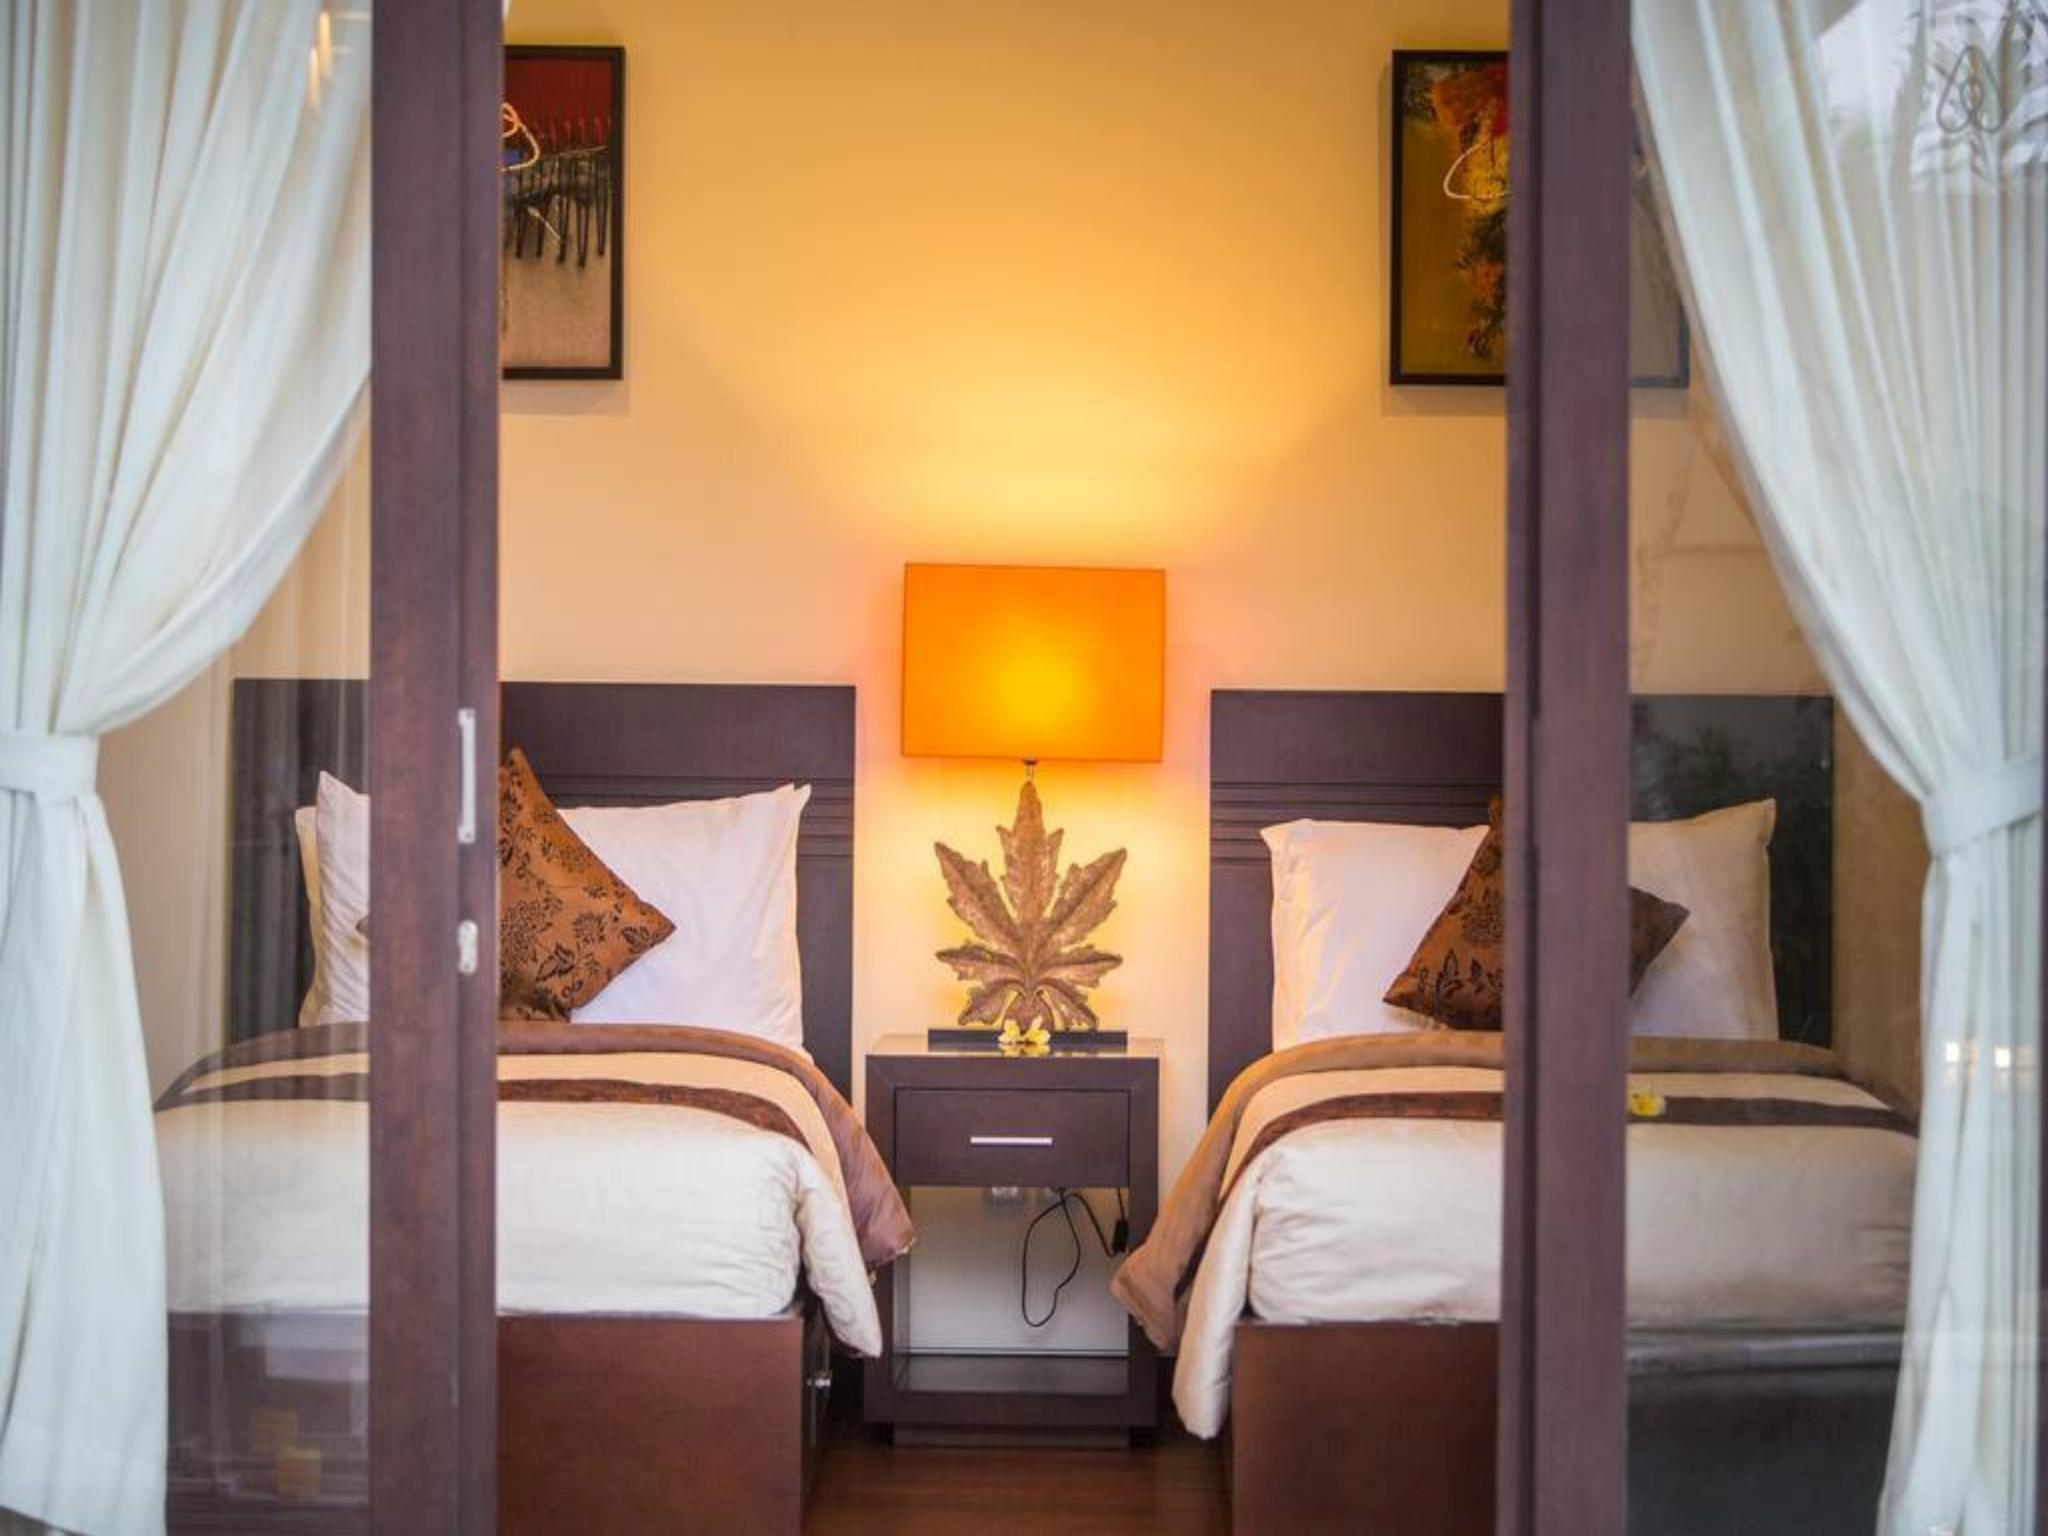 2 Bedroom Villas Kinori at Jimbaran - Brand New